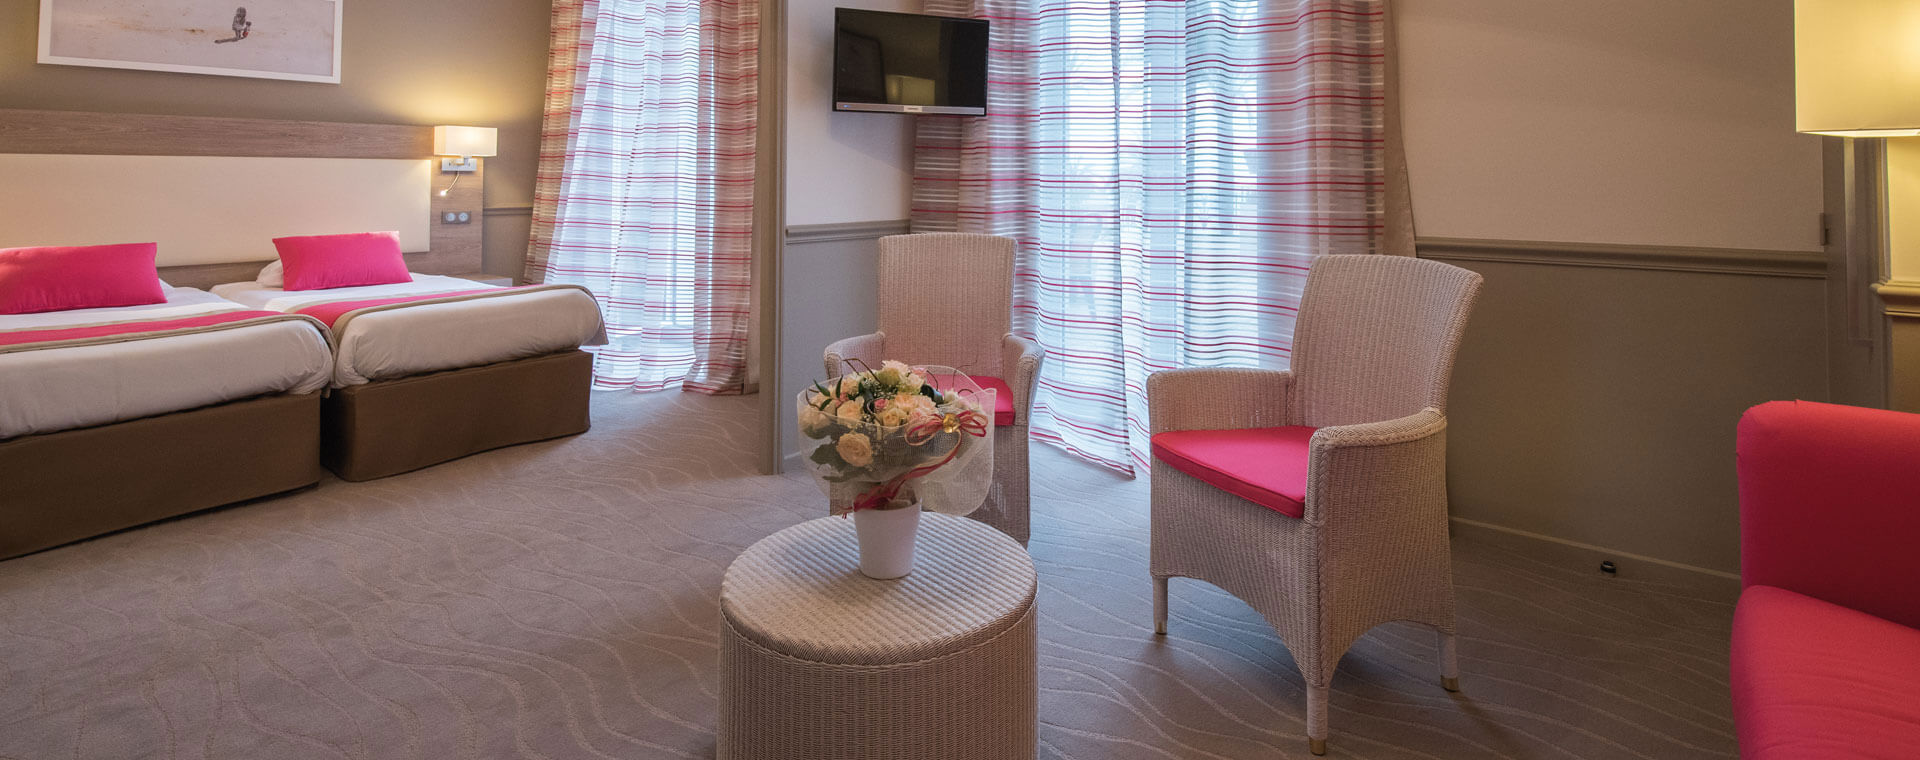 Chambre privilège - Hôtel*** Royal Westminster à Menton